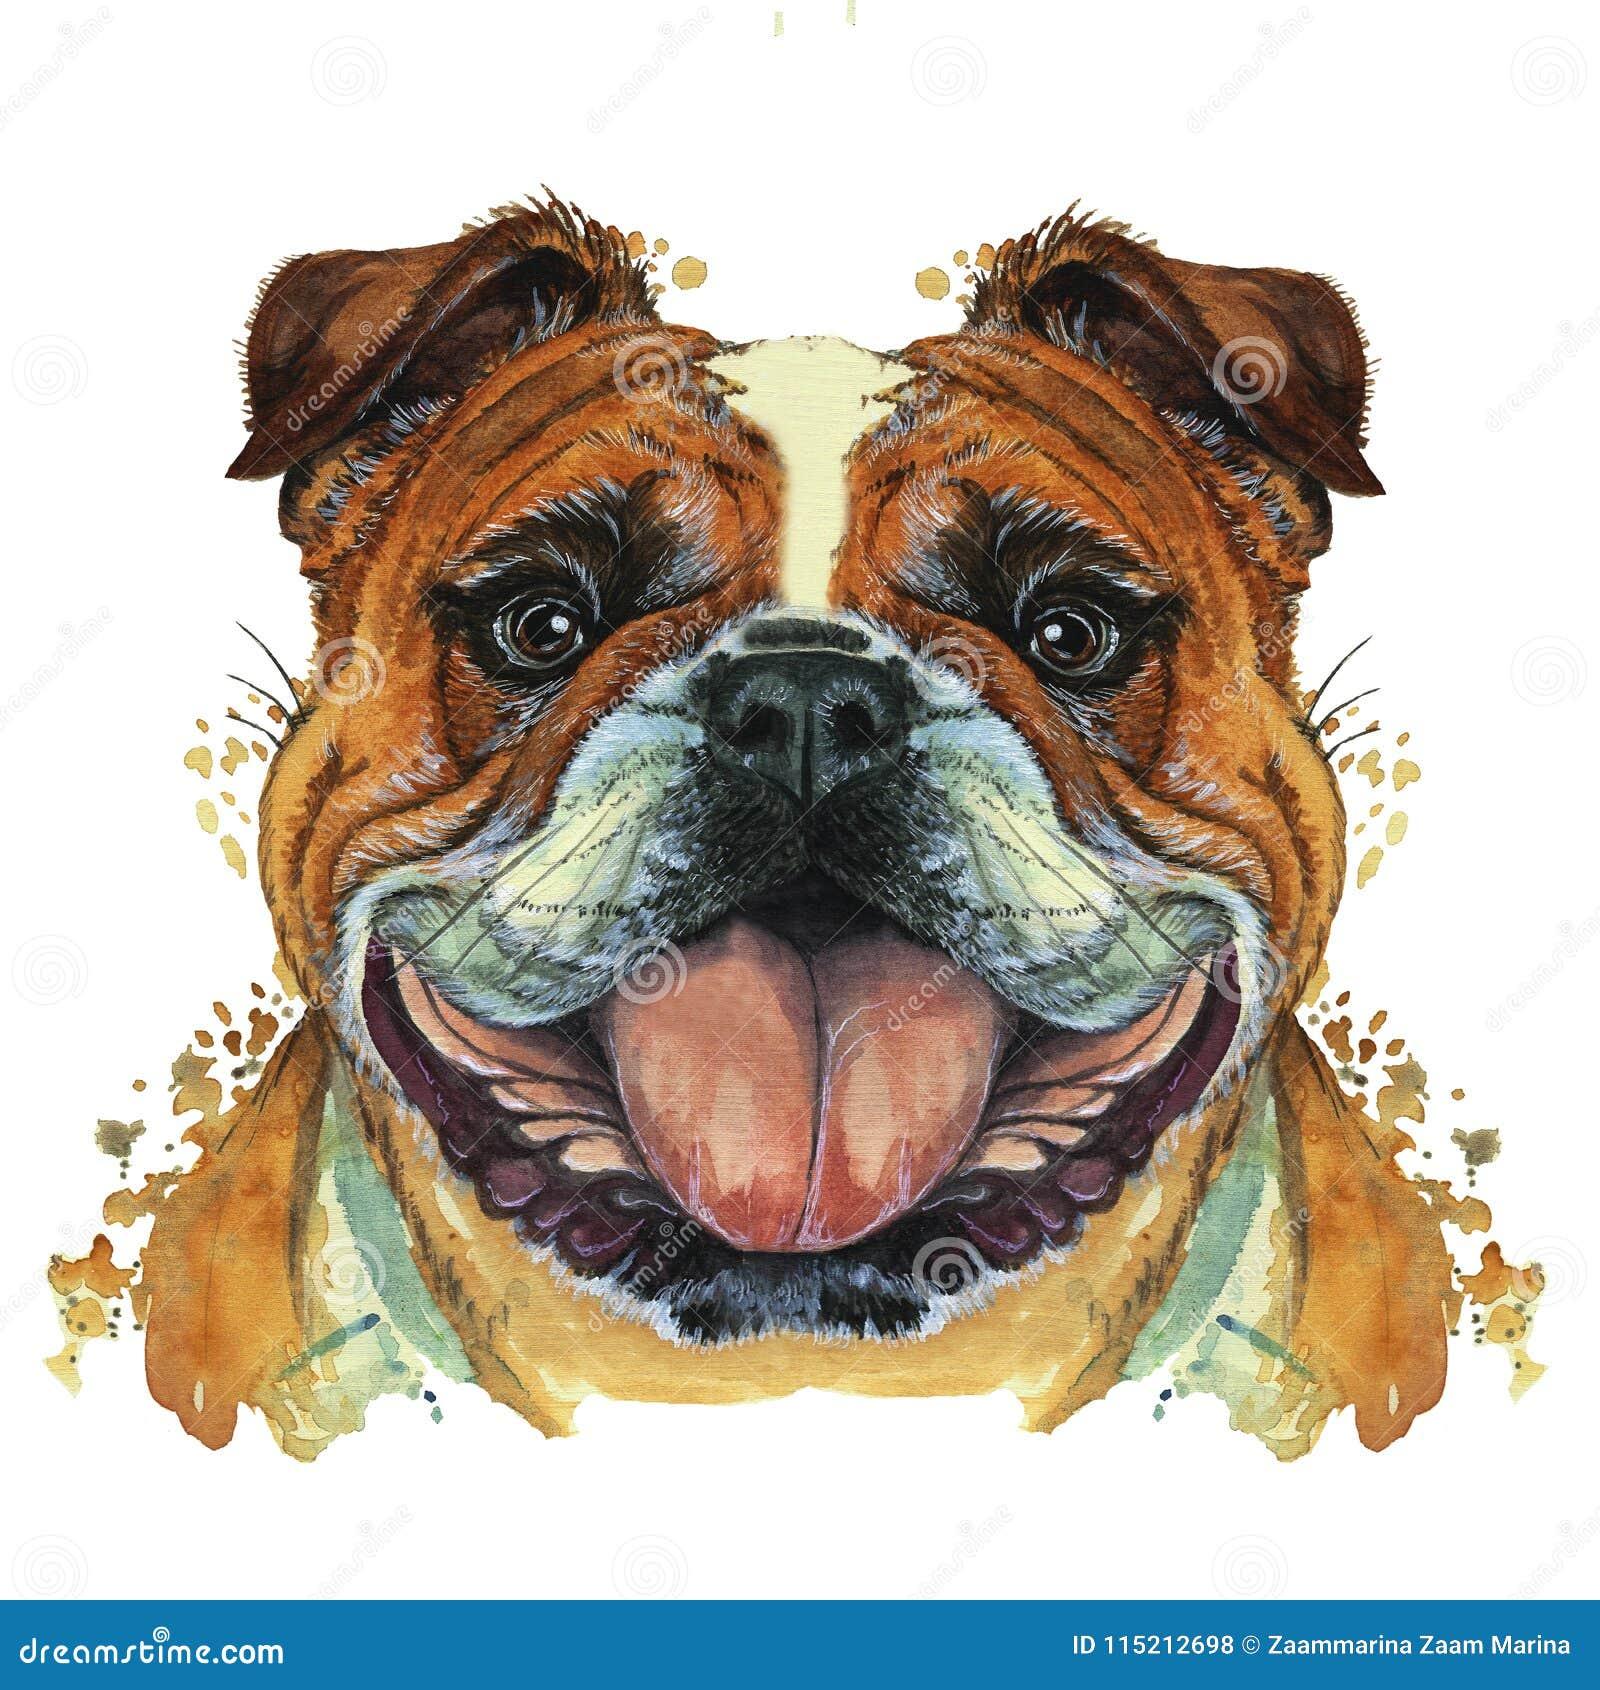 Waterverfprintshop, druk op het thema van het ras van honden, zoogdieren, dieren, kweekt Engelse buldog, buldog, portret, kleur r